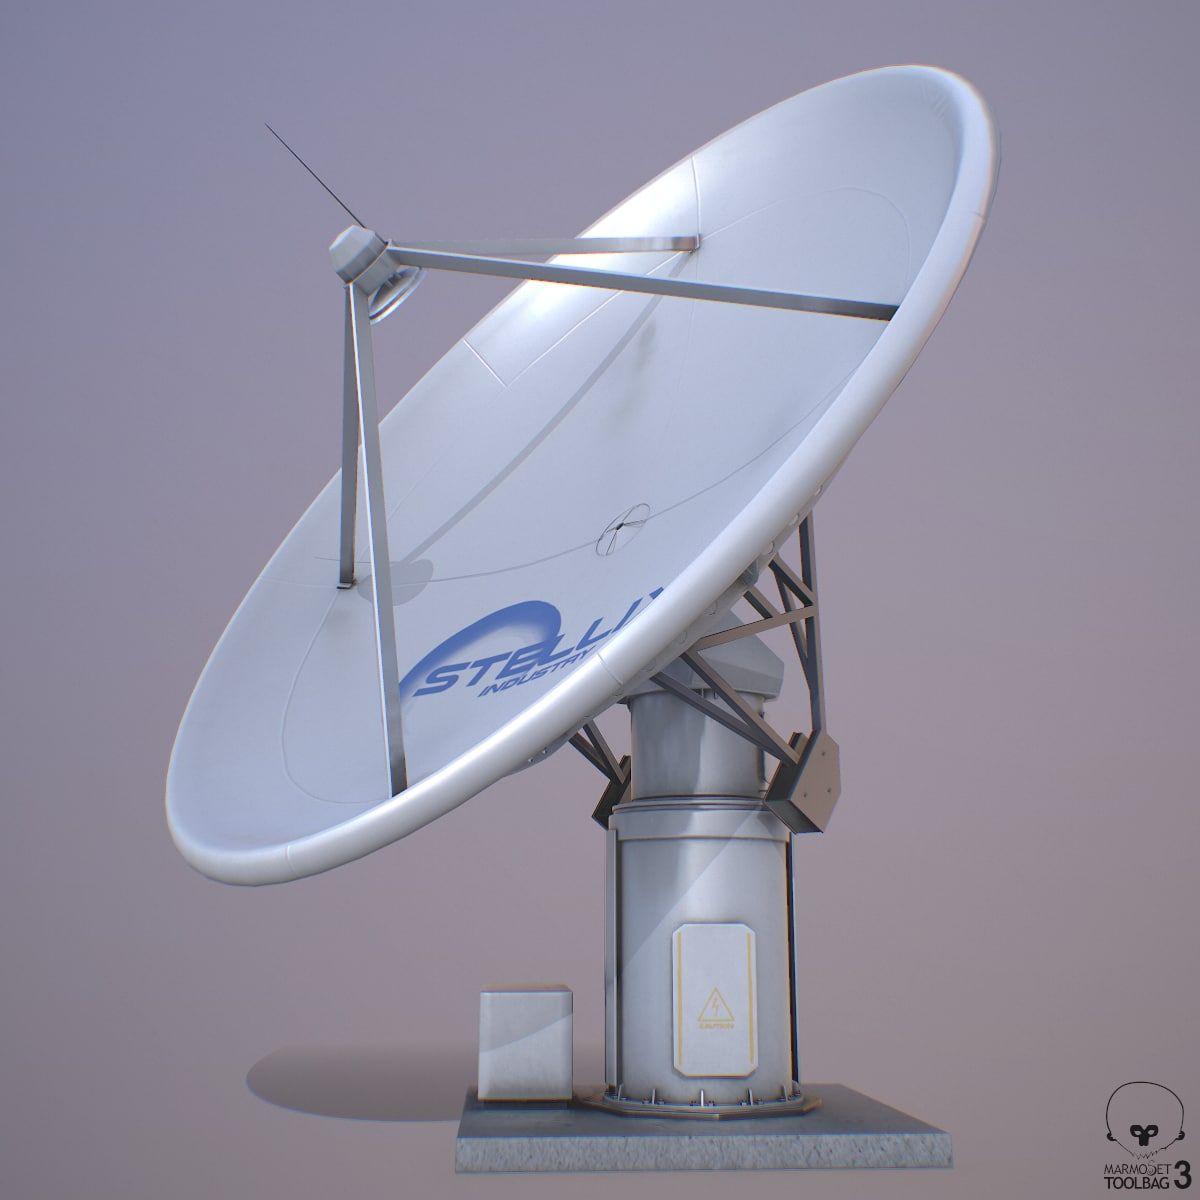 Satellite Dish Model Satellite Dish Architecture Drawing Art Satellites